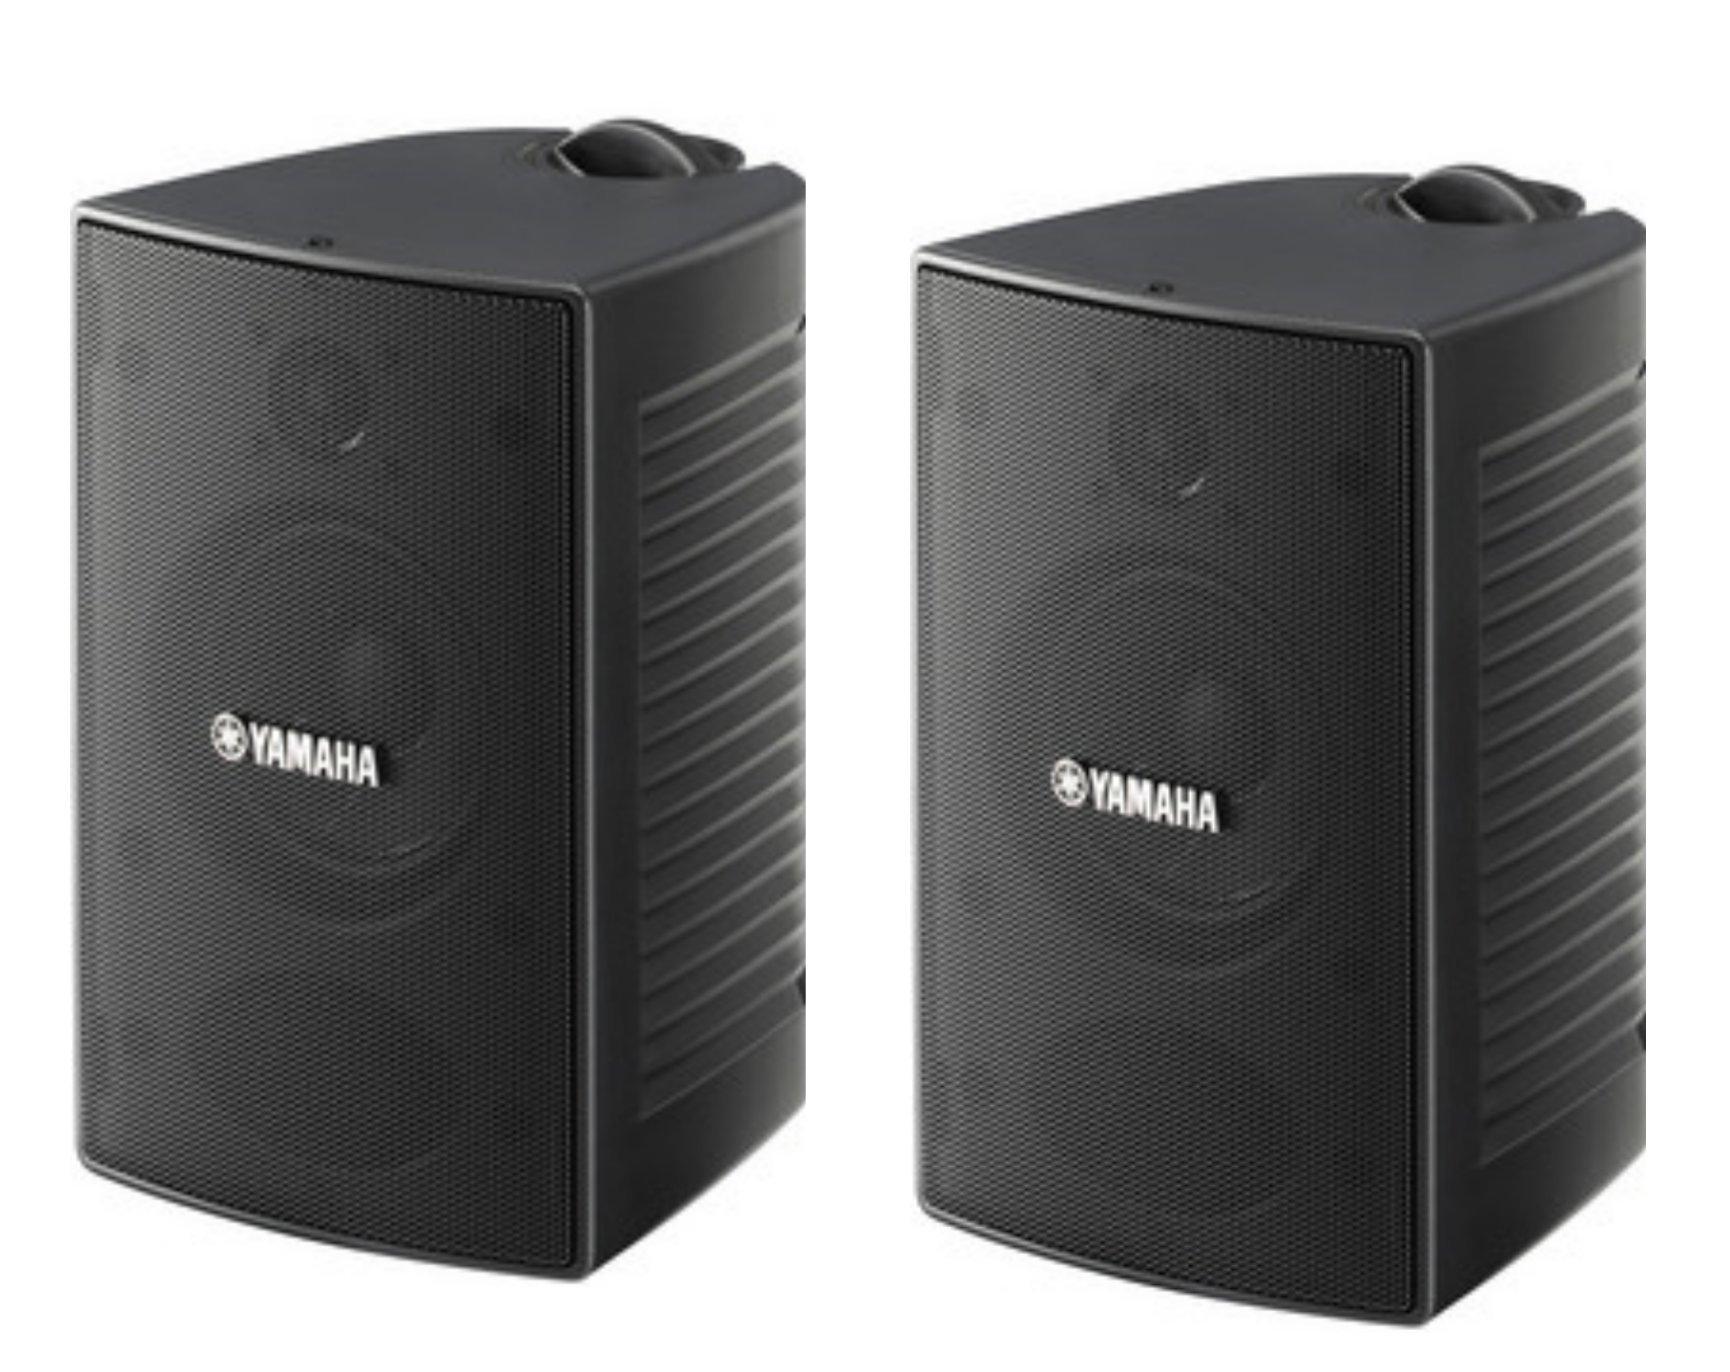 Yamaha High Performance Surround Weatherproof Speakers